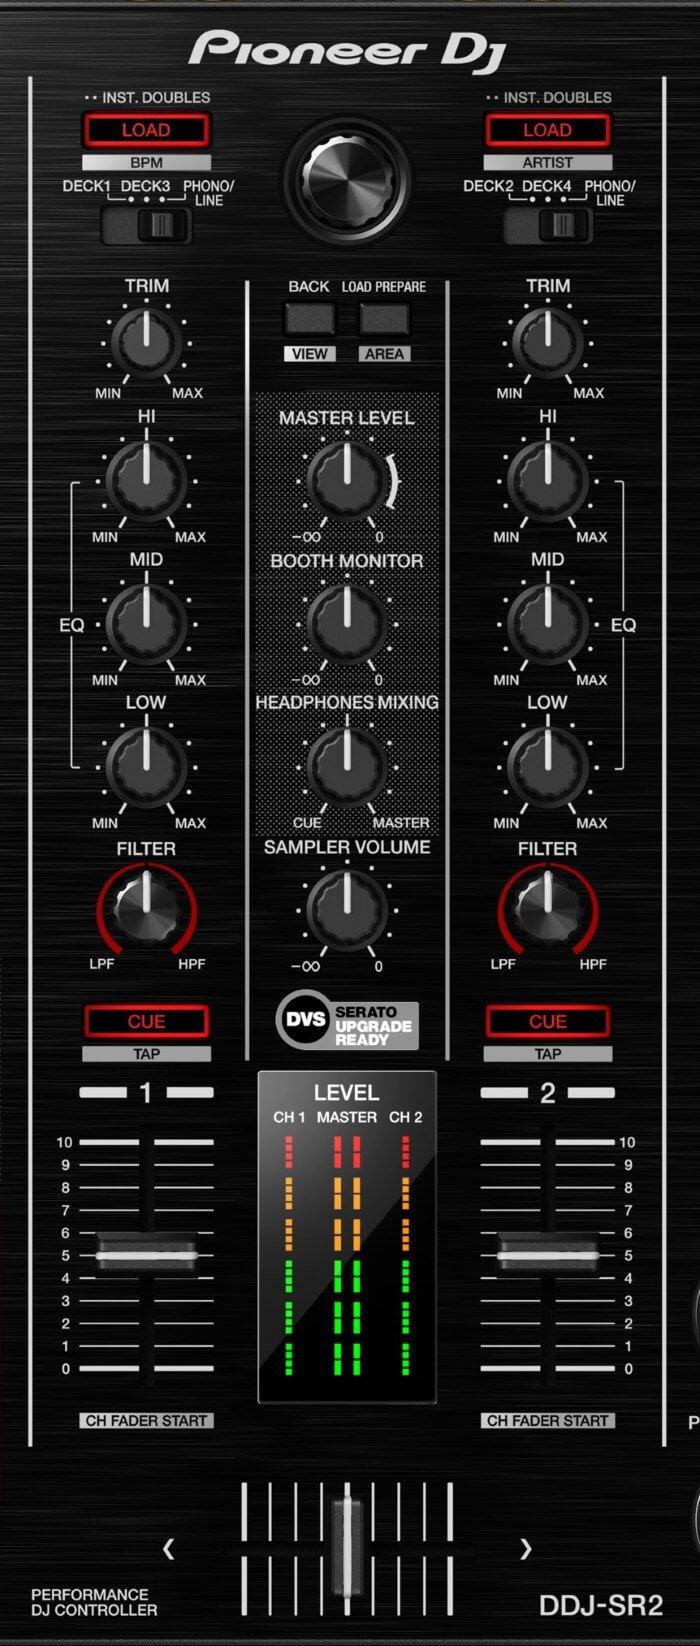 Pioneer DJ DDJ-SR2 mixer section